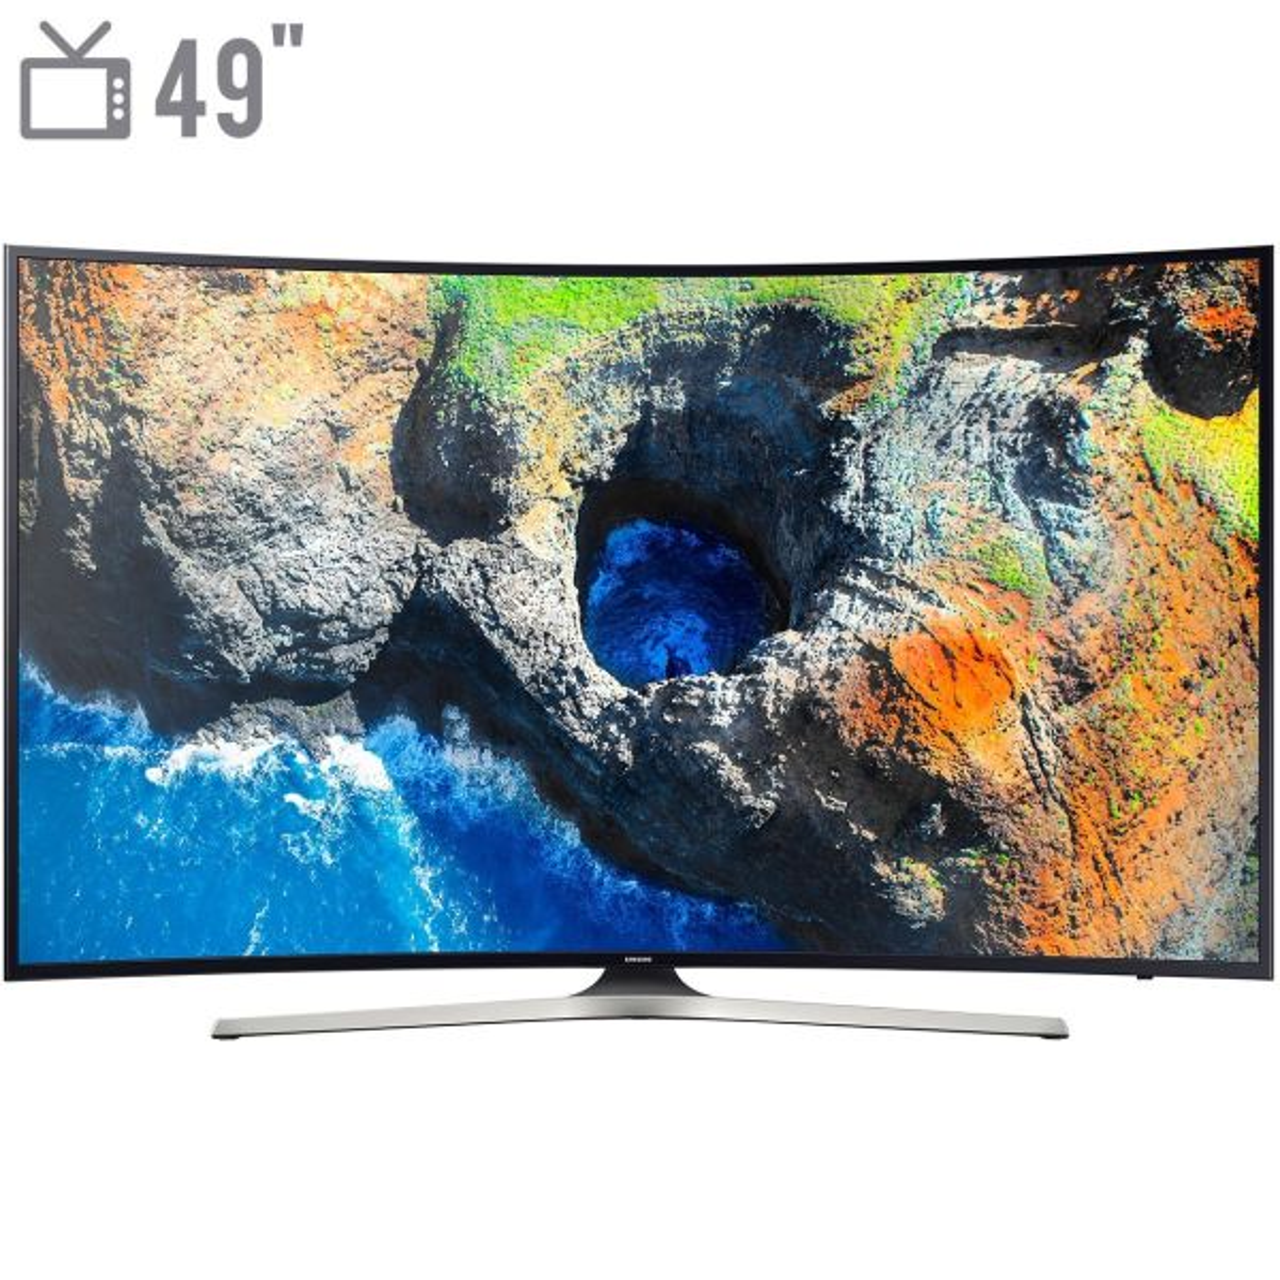 تلویزیون ال ای دی هوشمند خمیده سامسونگ مدل 49MU7985 سایز 49 اینچ